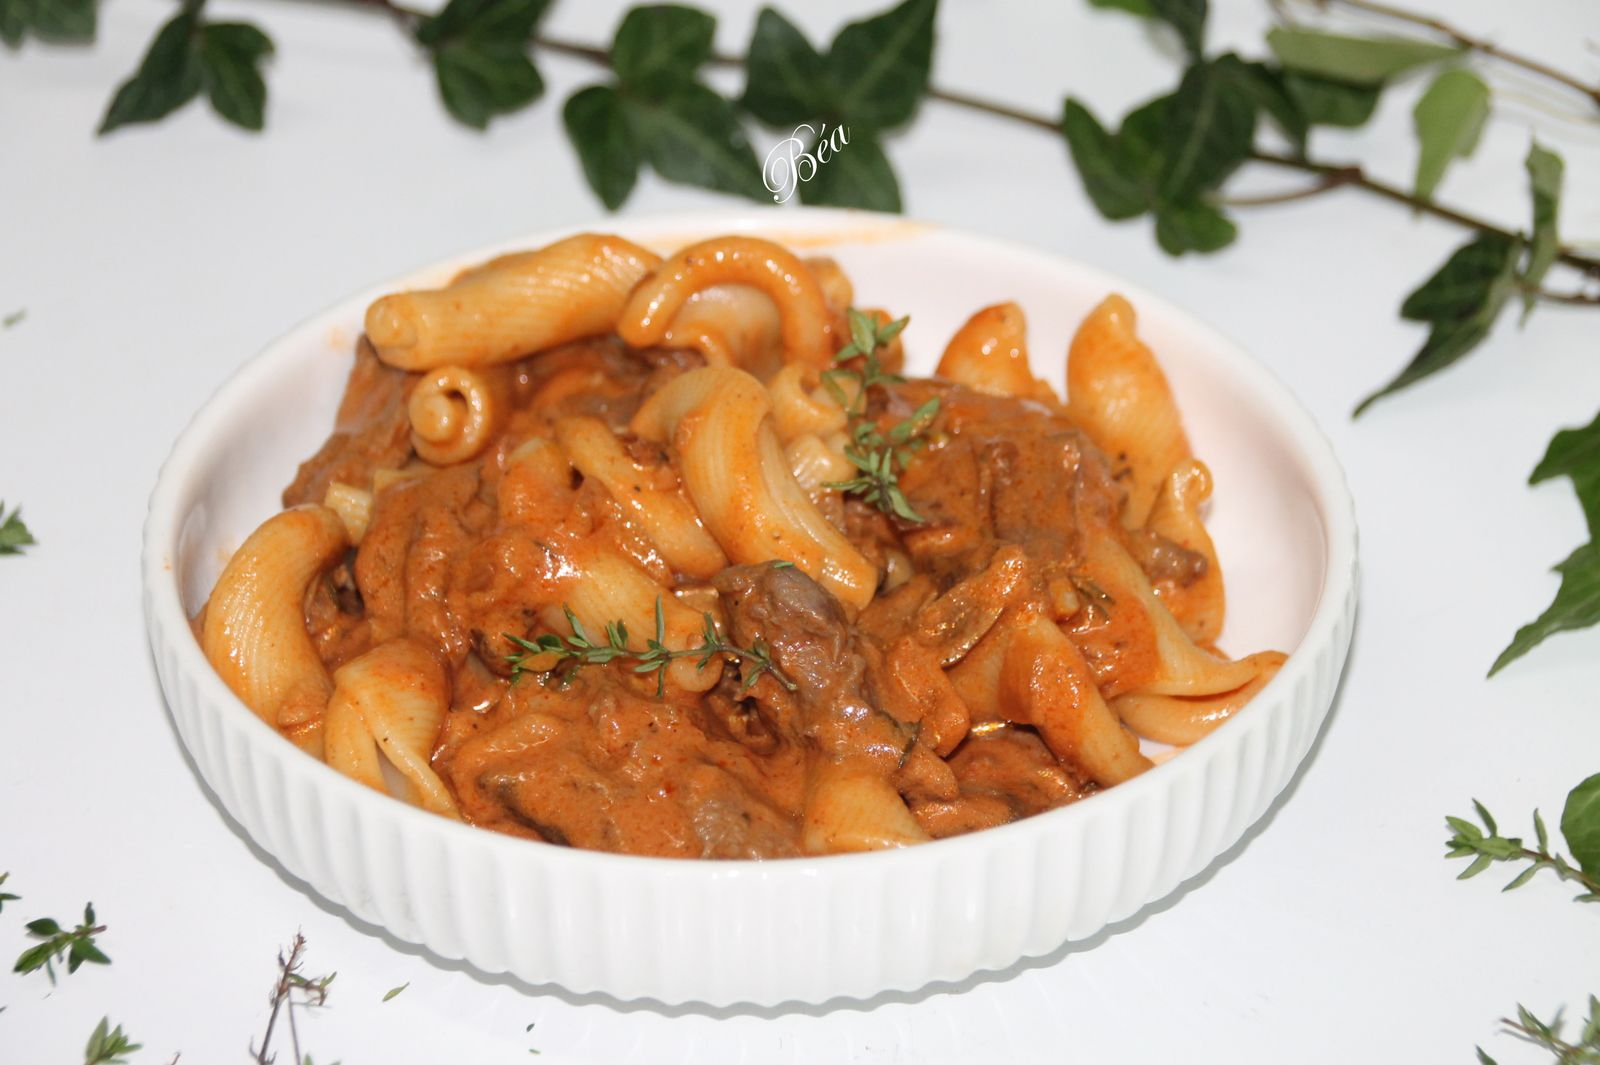 Pâtes sauce stroganoff